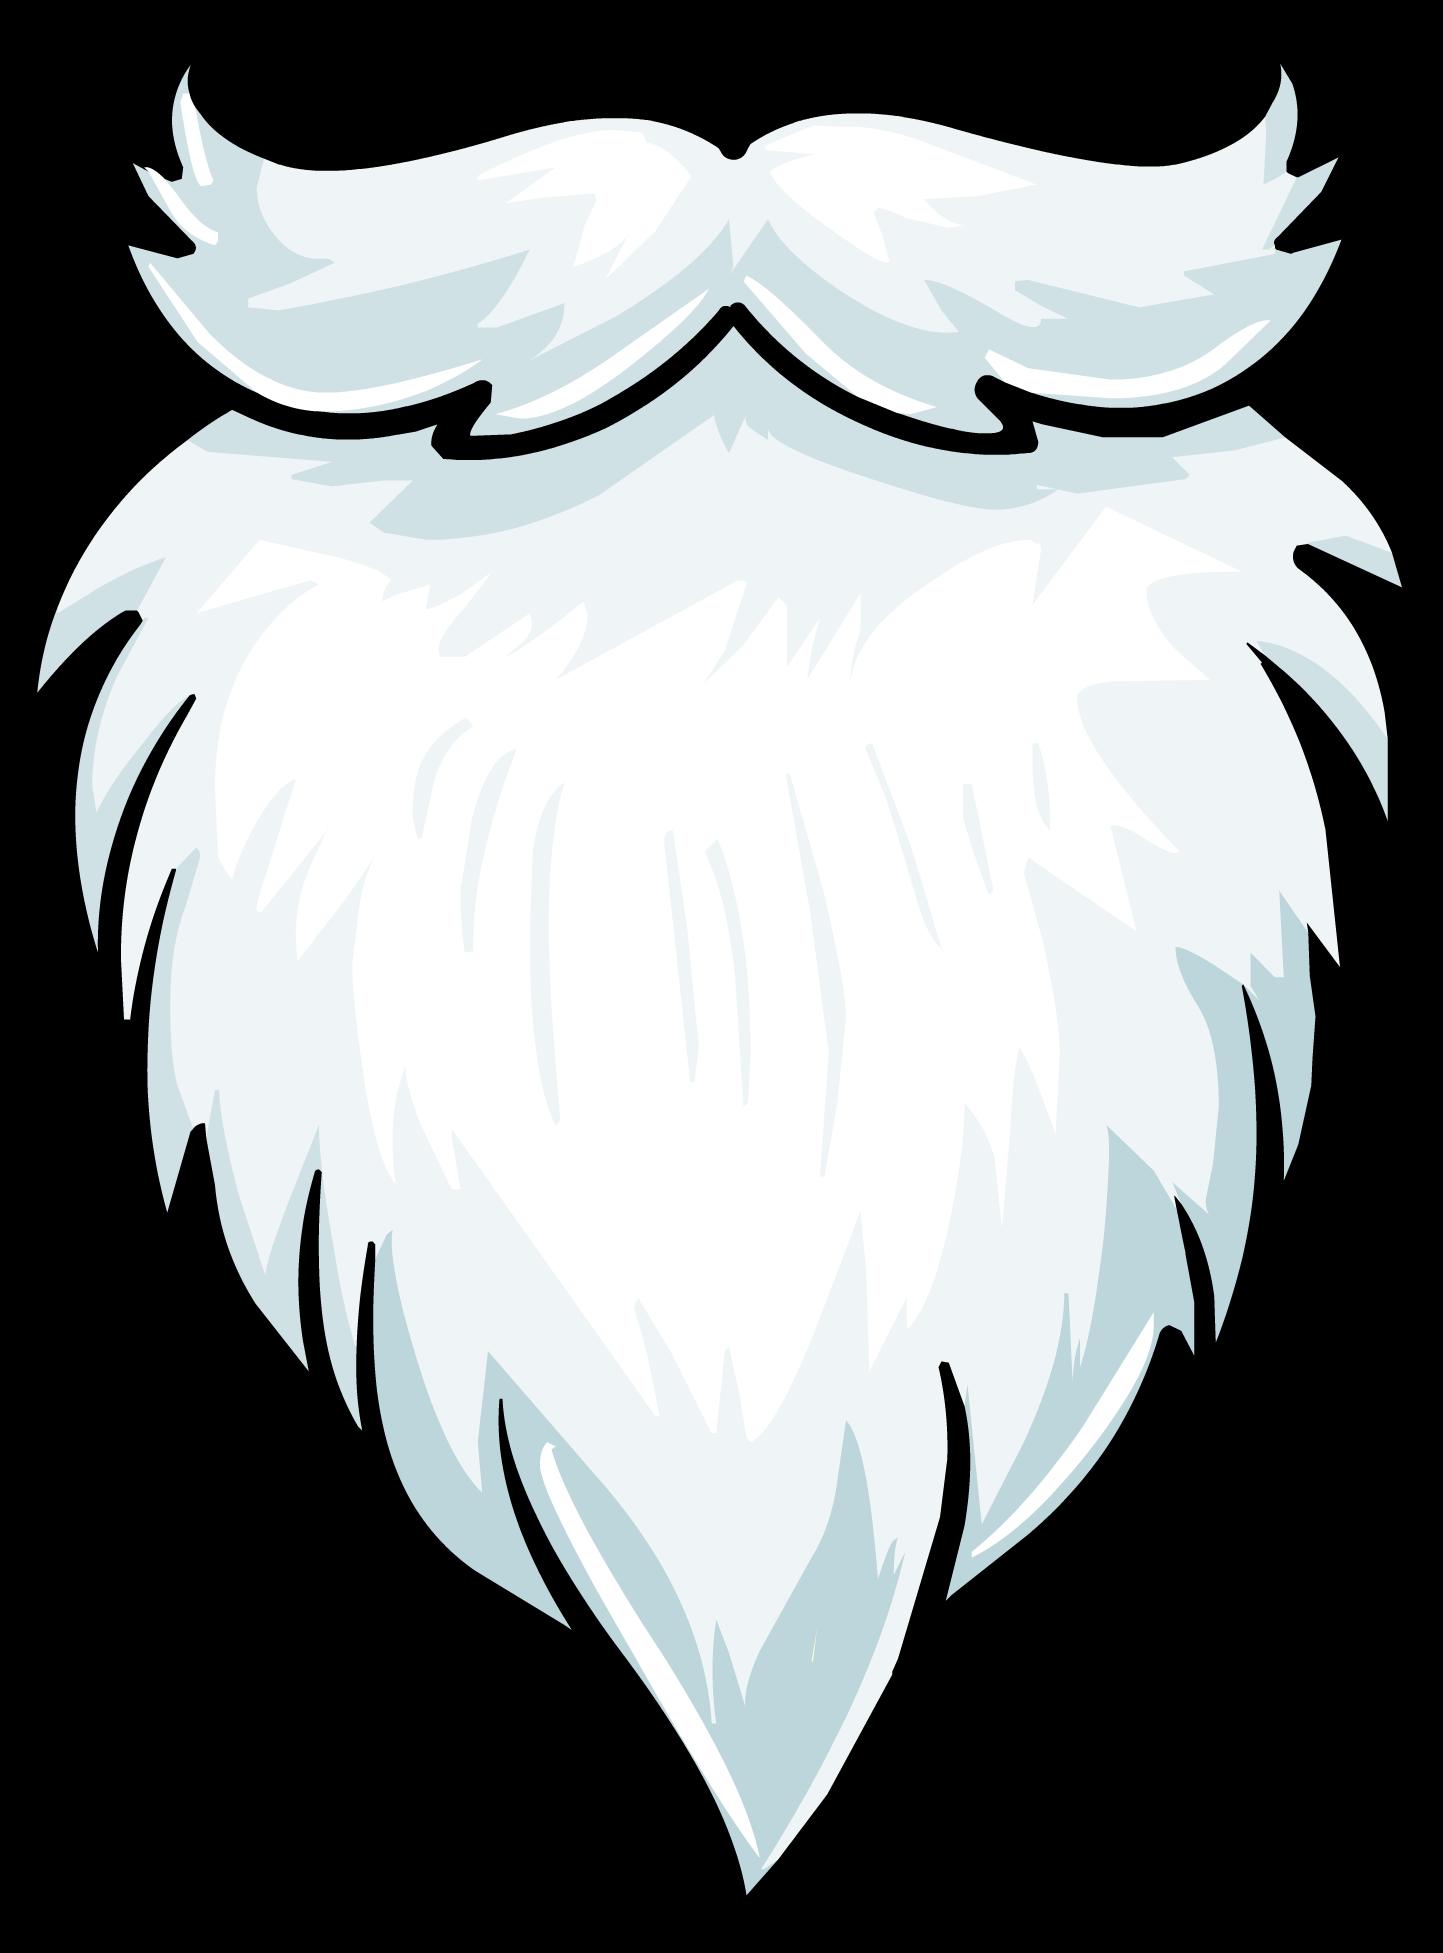 e1f3620a1 Beard Clipart Plain - Santa Beard - Png Download (1195x1618), Png Download. Download  Transparent Png